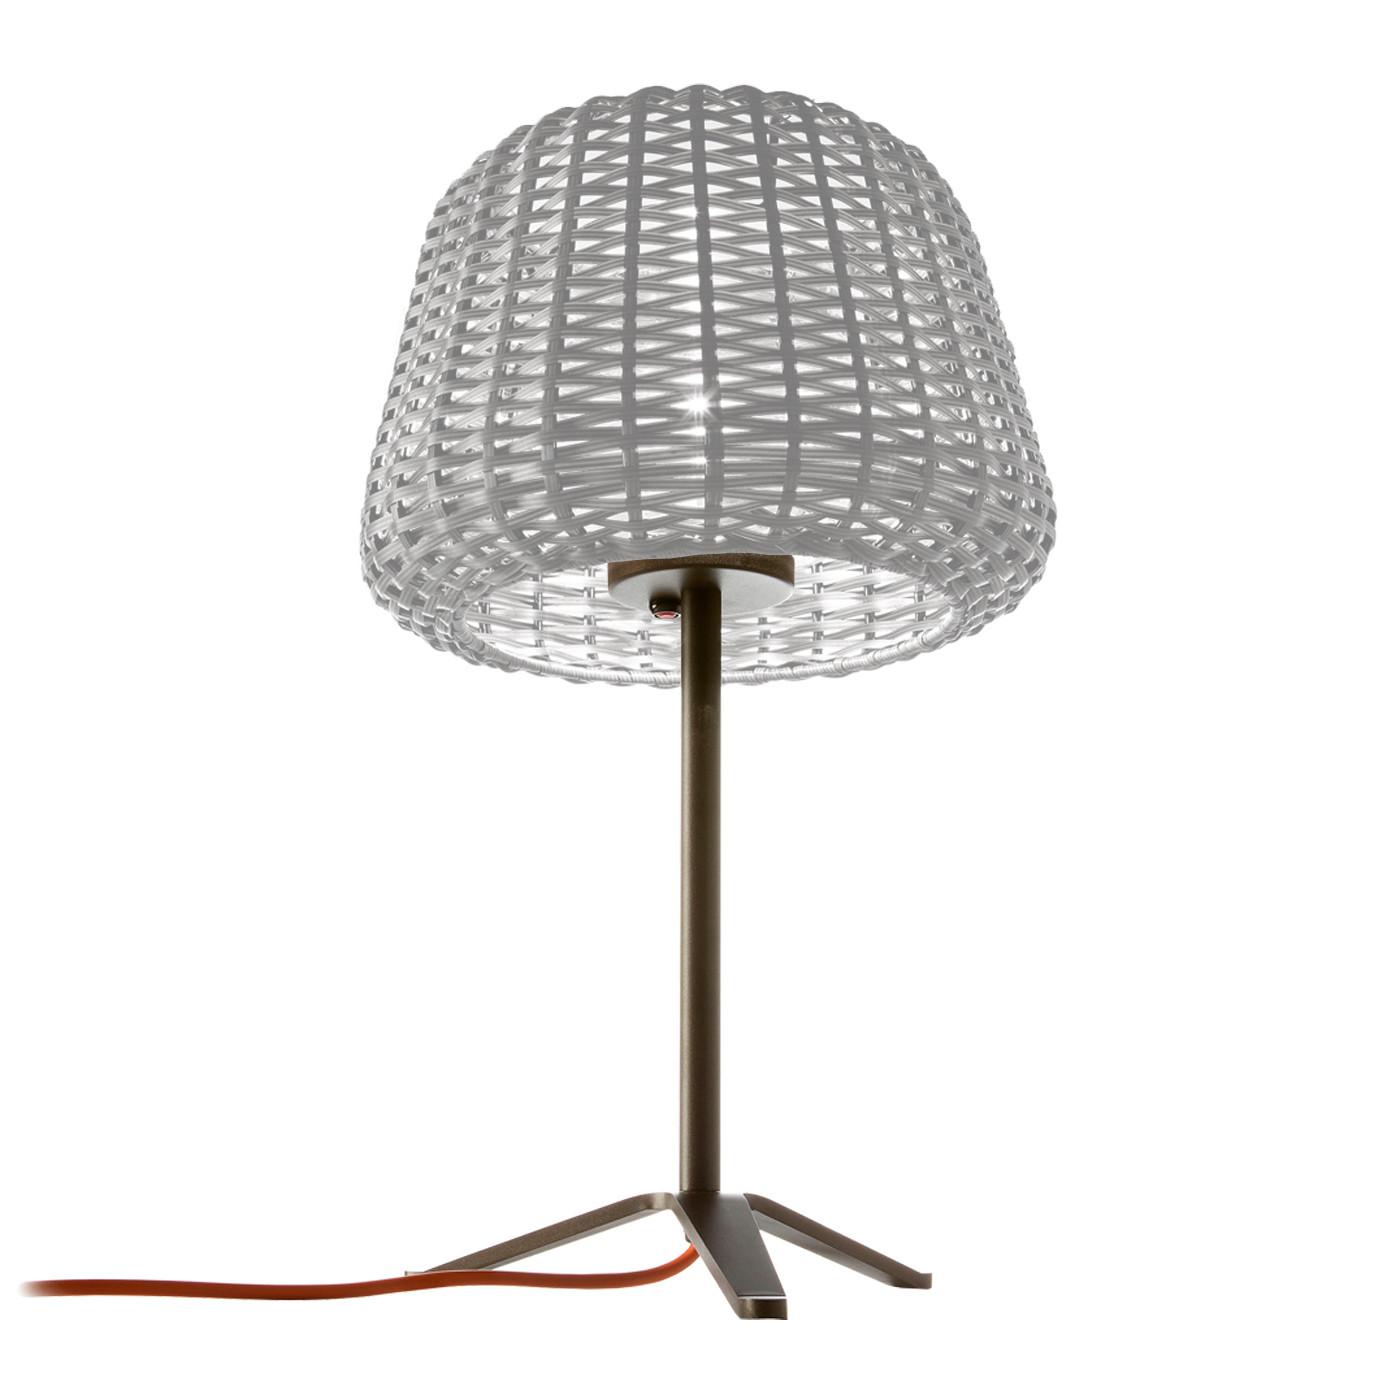 Panzeri Ralph Lampe de table